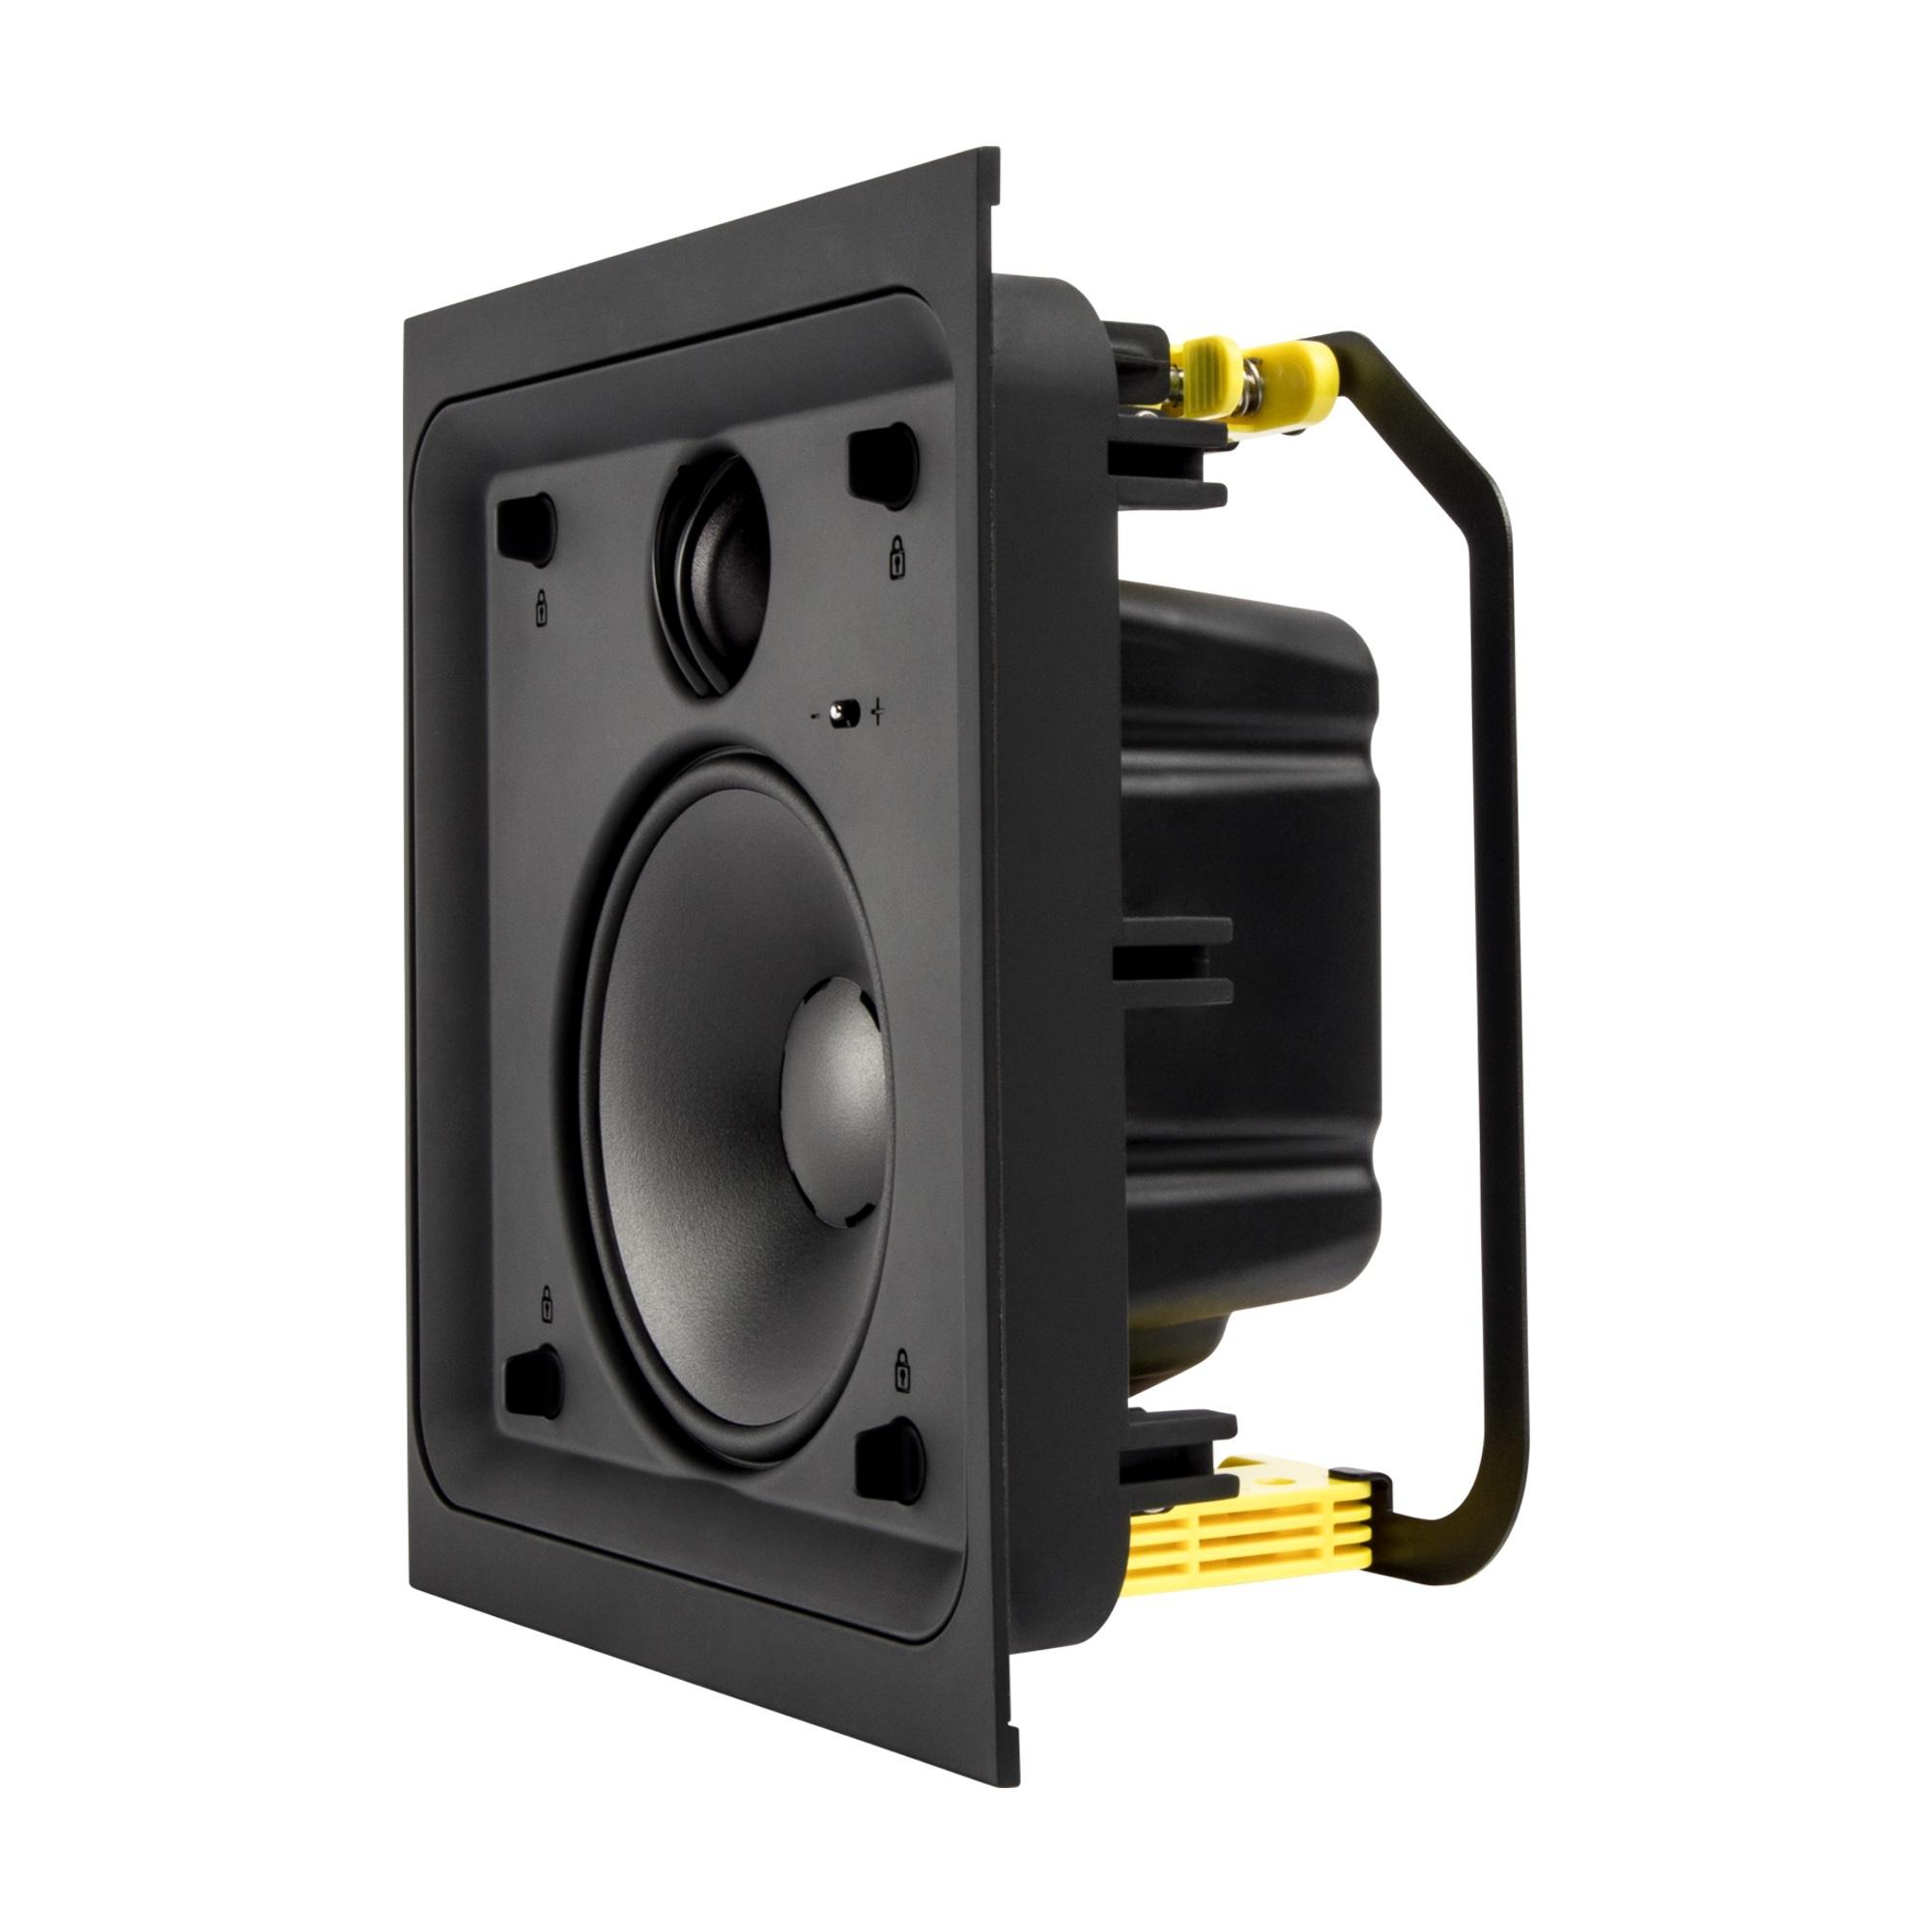 Dynaudio Dynaudio Studio Series S4-LCR65MT In-wall speaker